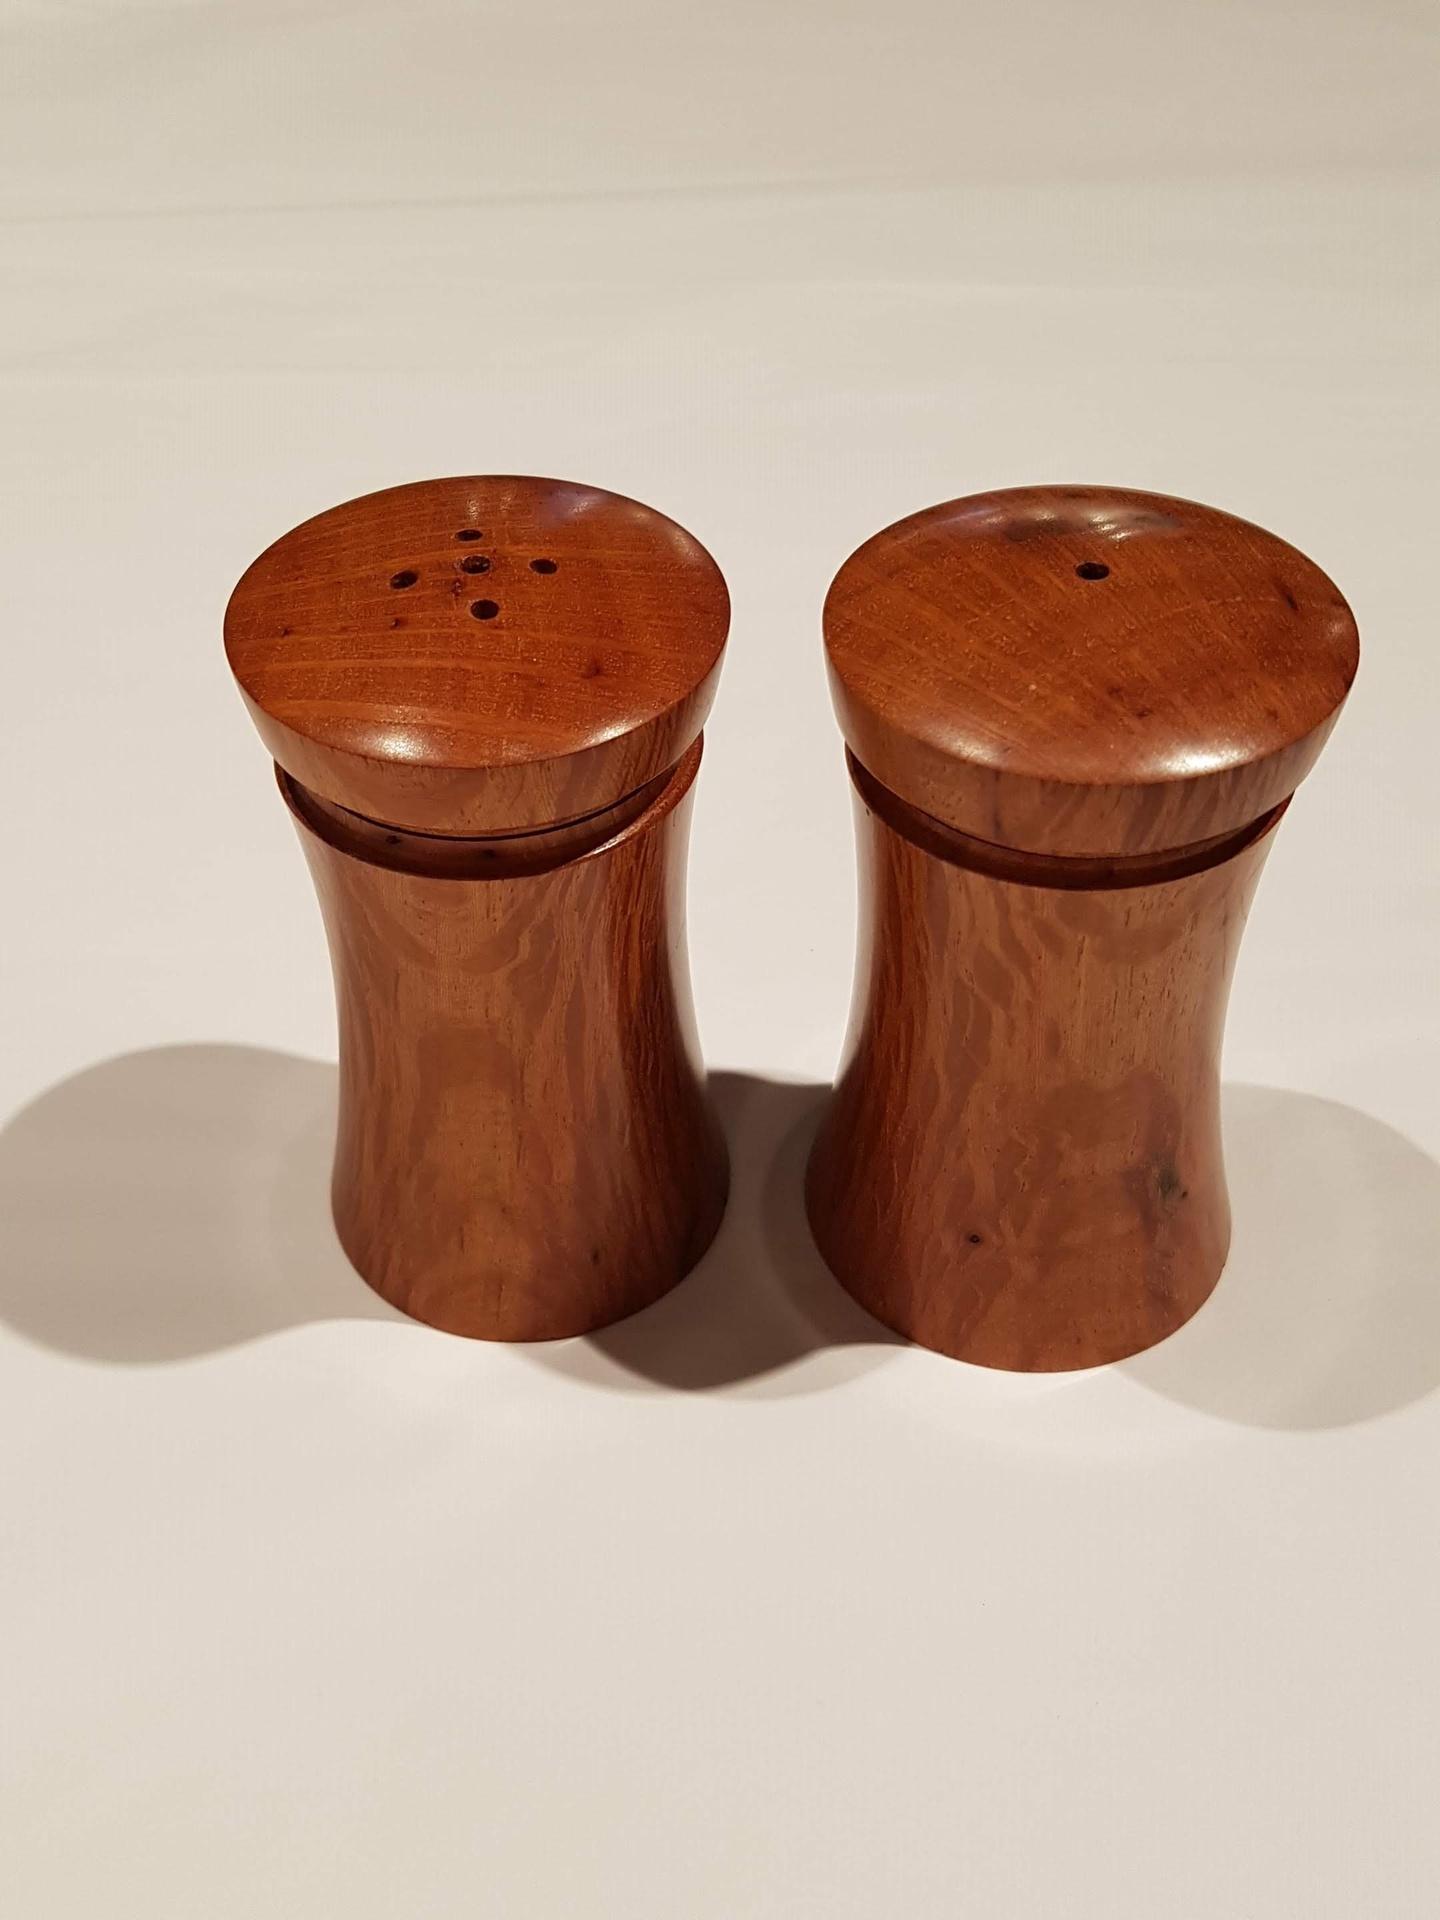 Flame Sheoak Salt and Pepper Shakers